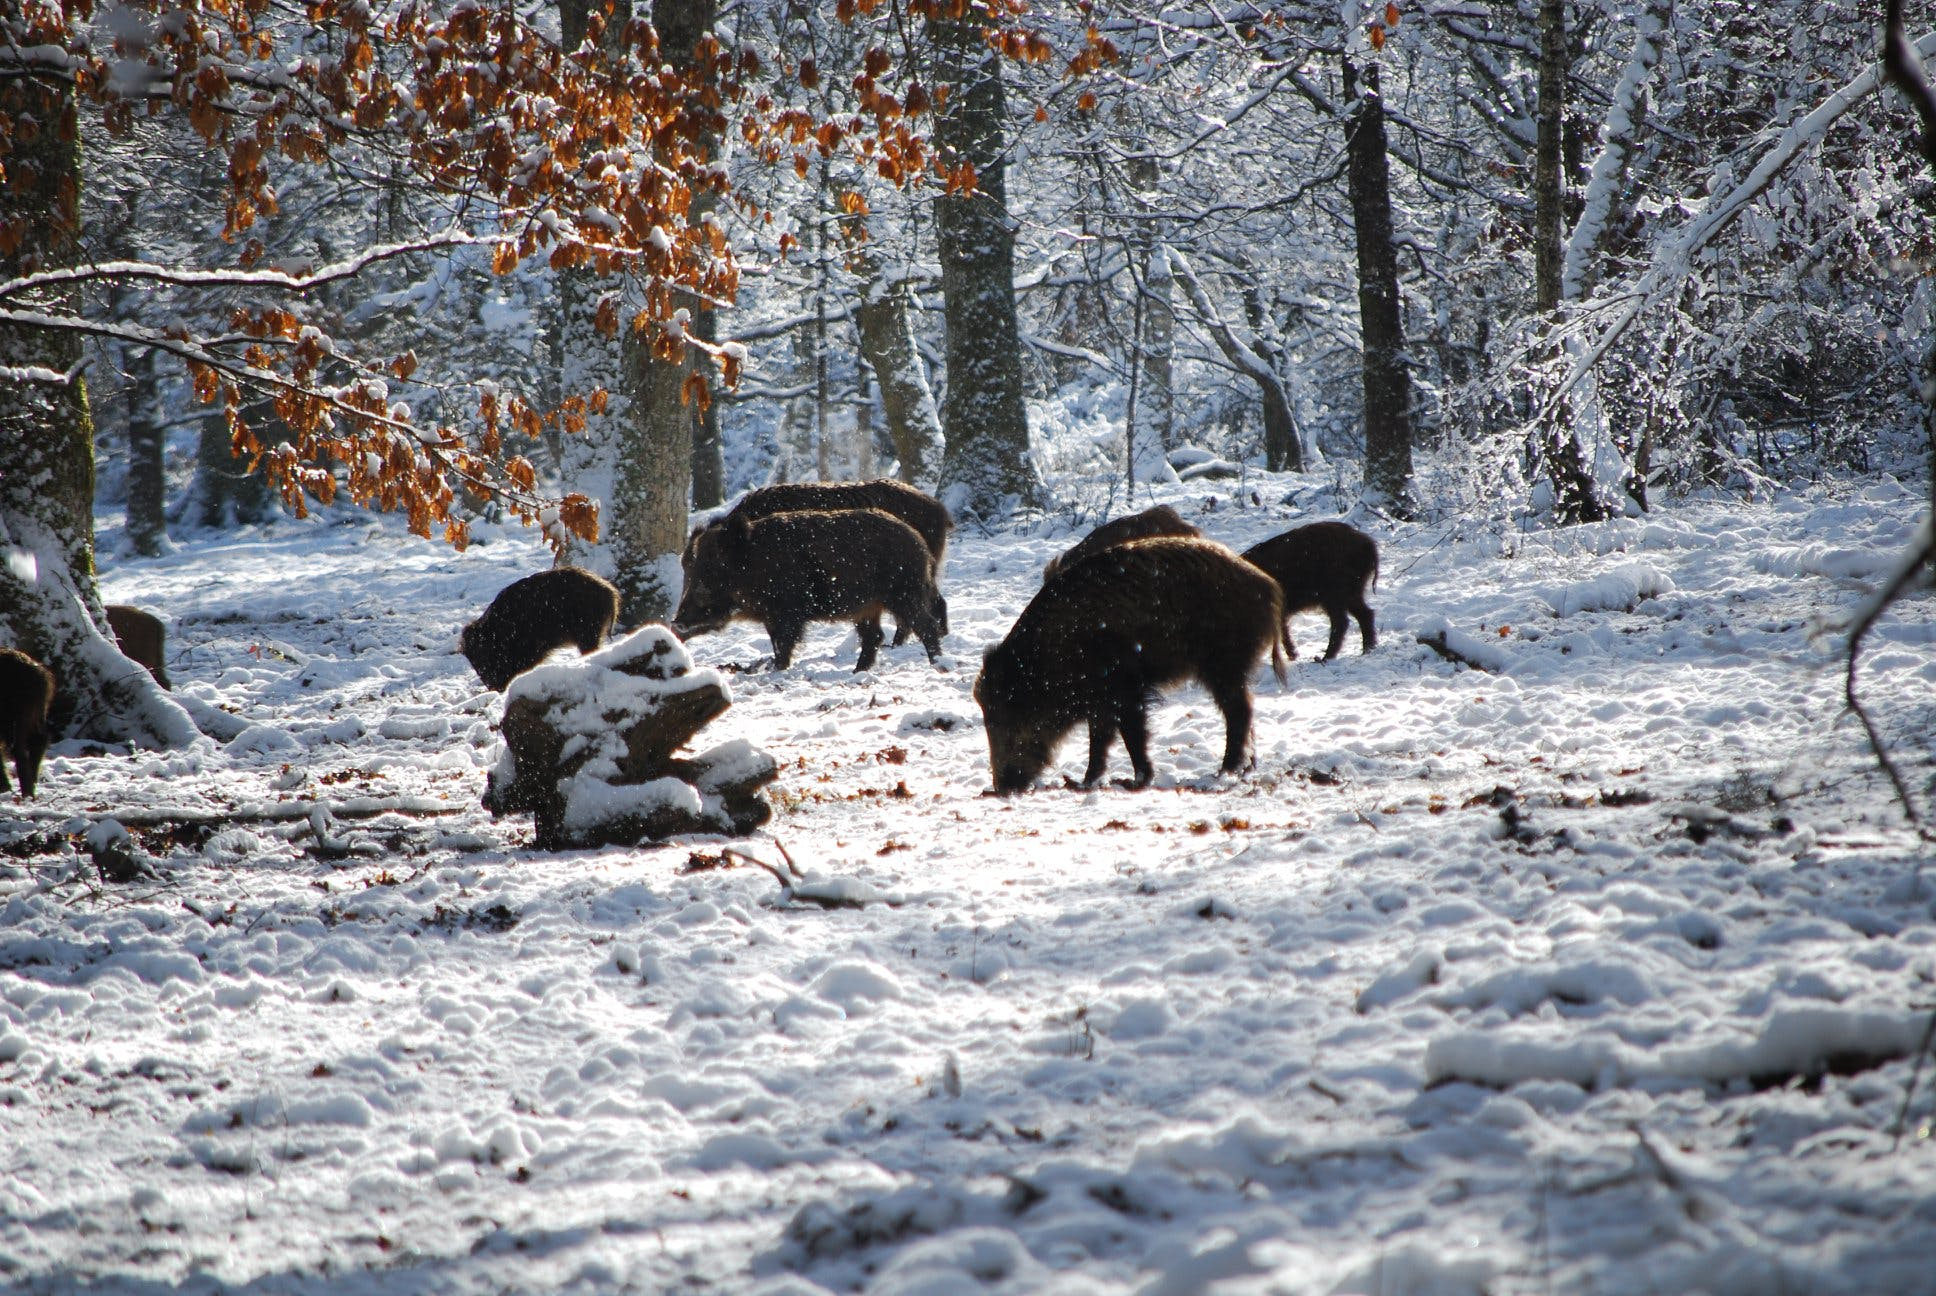 Boars on Snow Near Trees